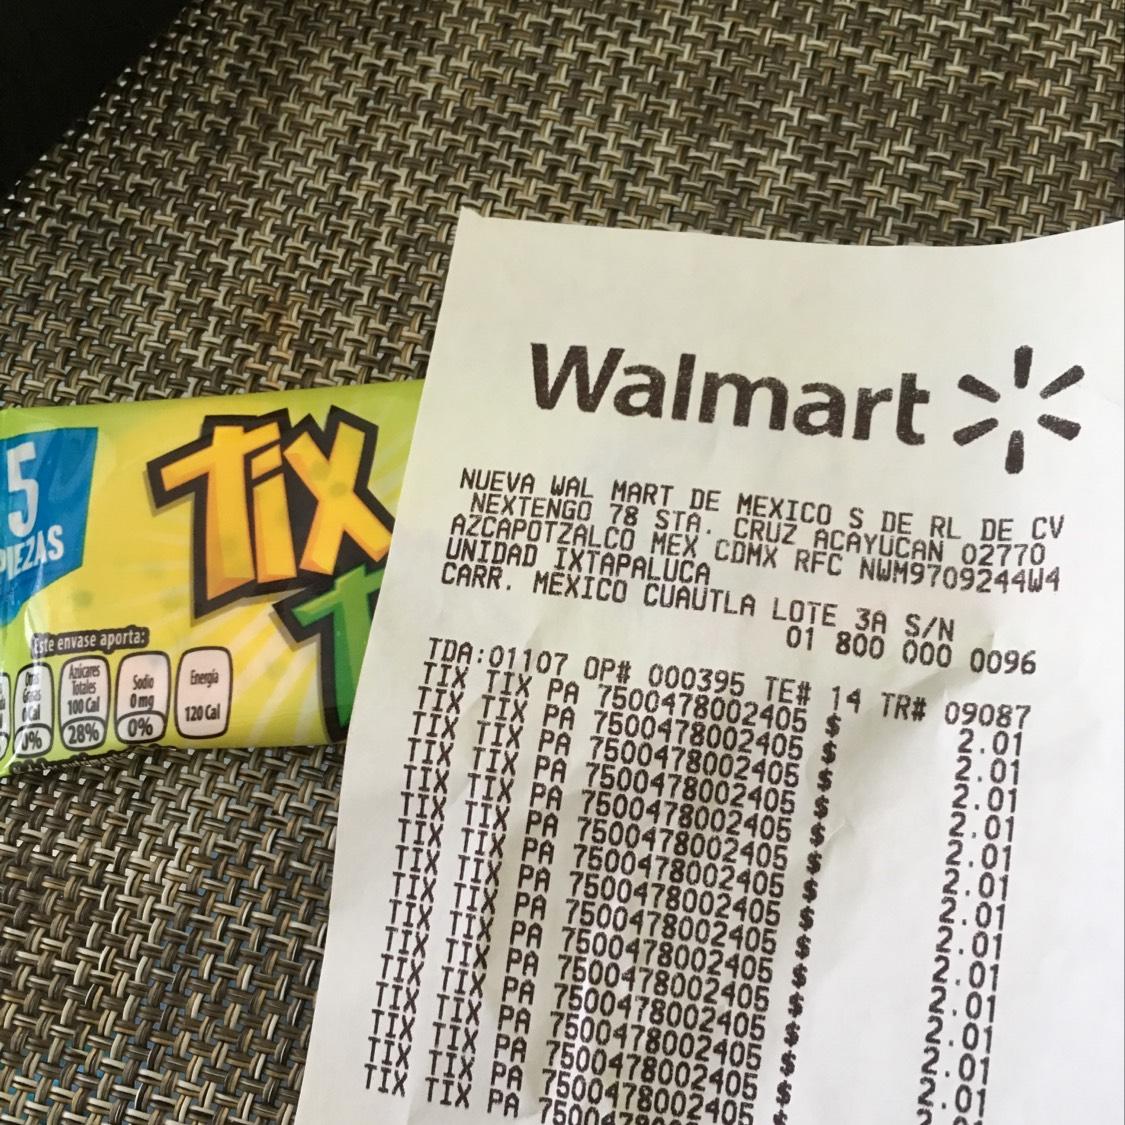 Walmart Ixtapaluca: Tix Tix y más